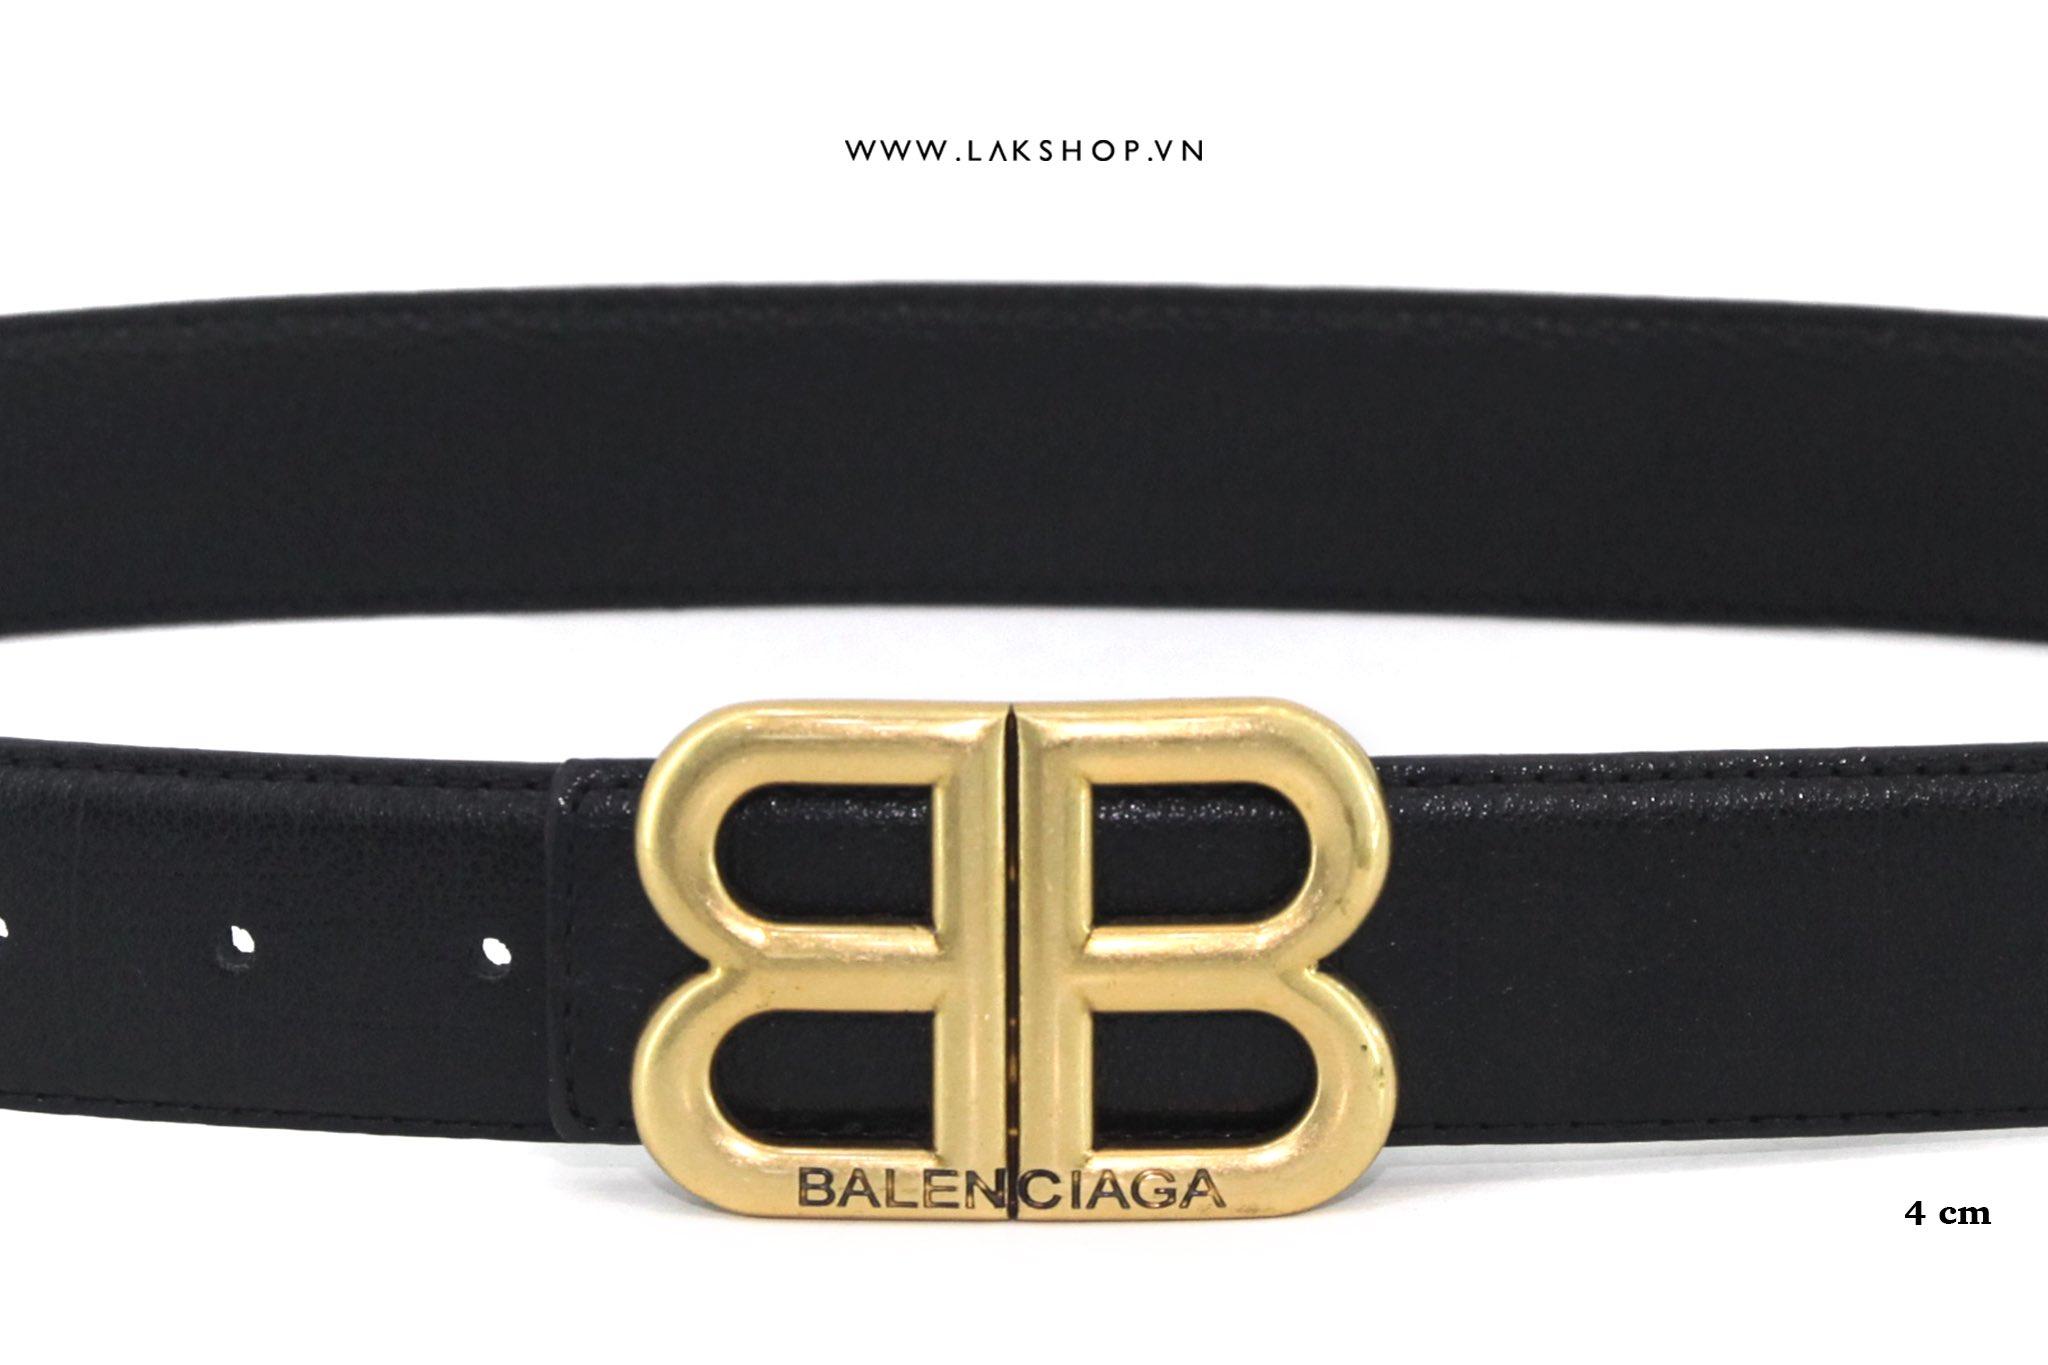 Balenciaga BB Gold Logo Buckle Leather Belt (4cm)